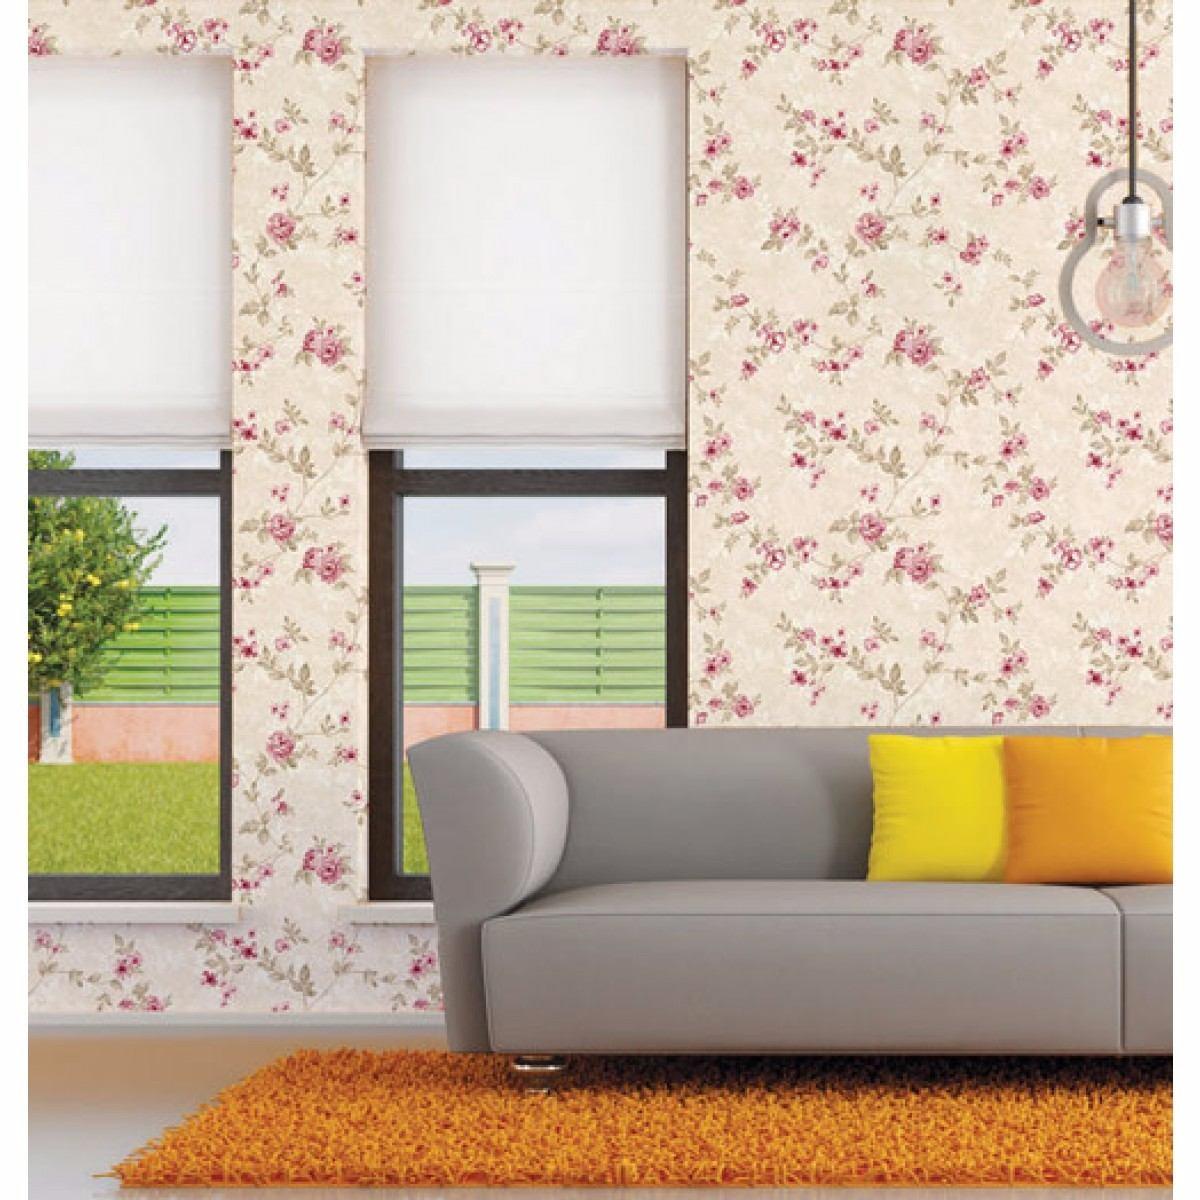 Papel de parede floral rosa adesivo contact vin lico lavavel r 47 00 em mercado livre - Vinilico para paredes ...